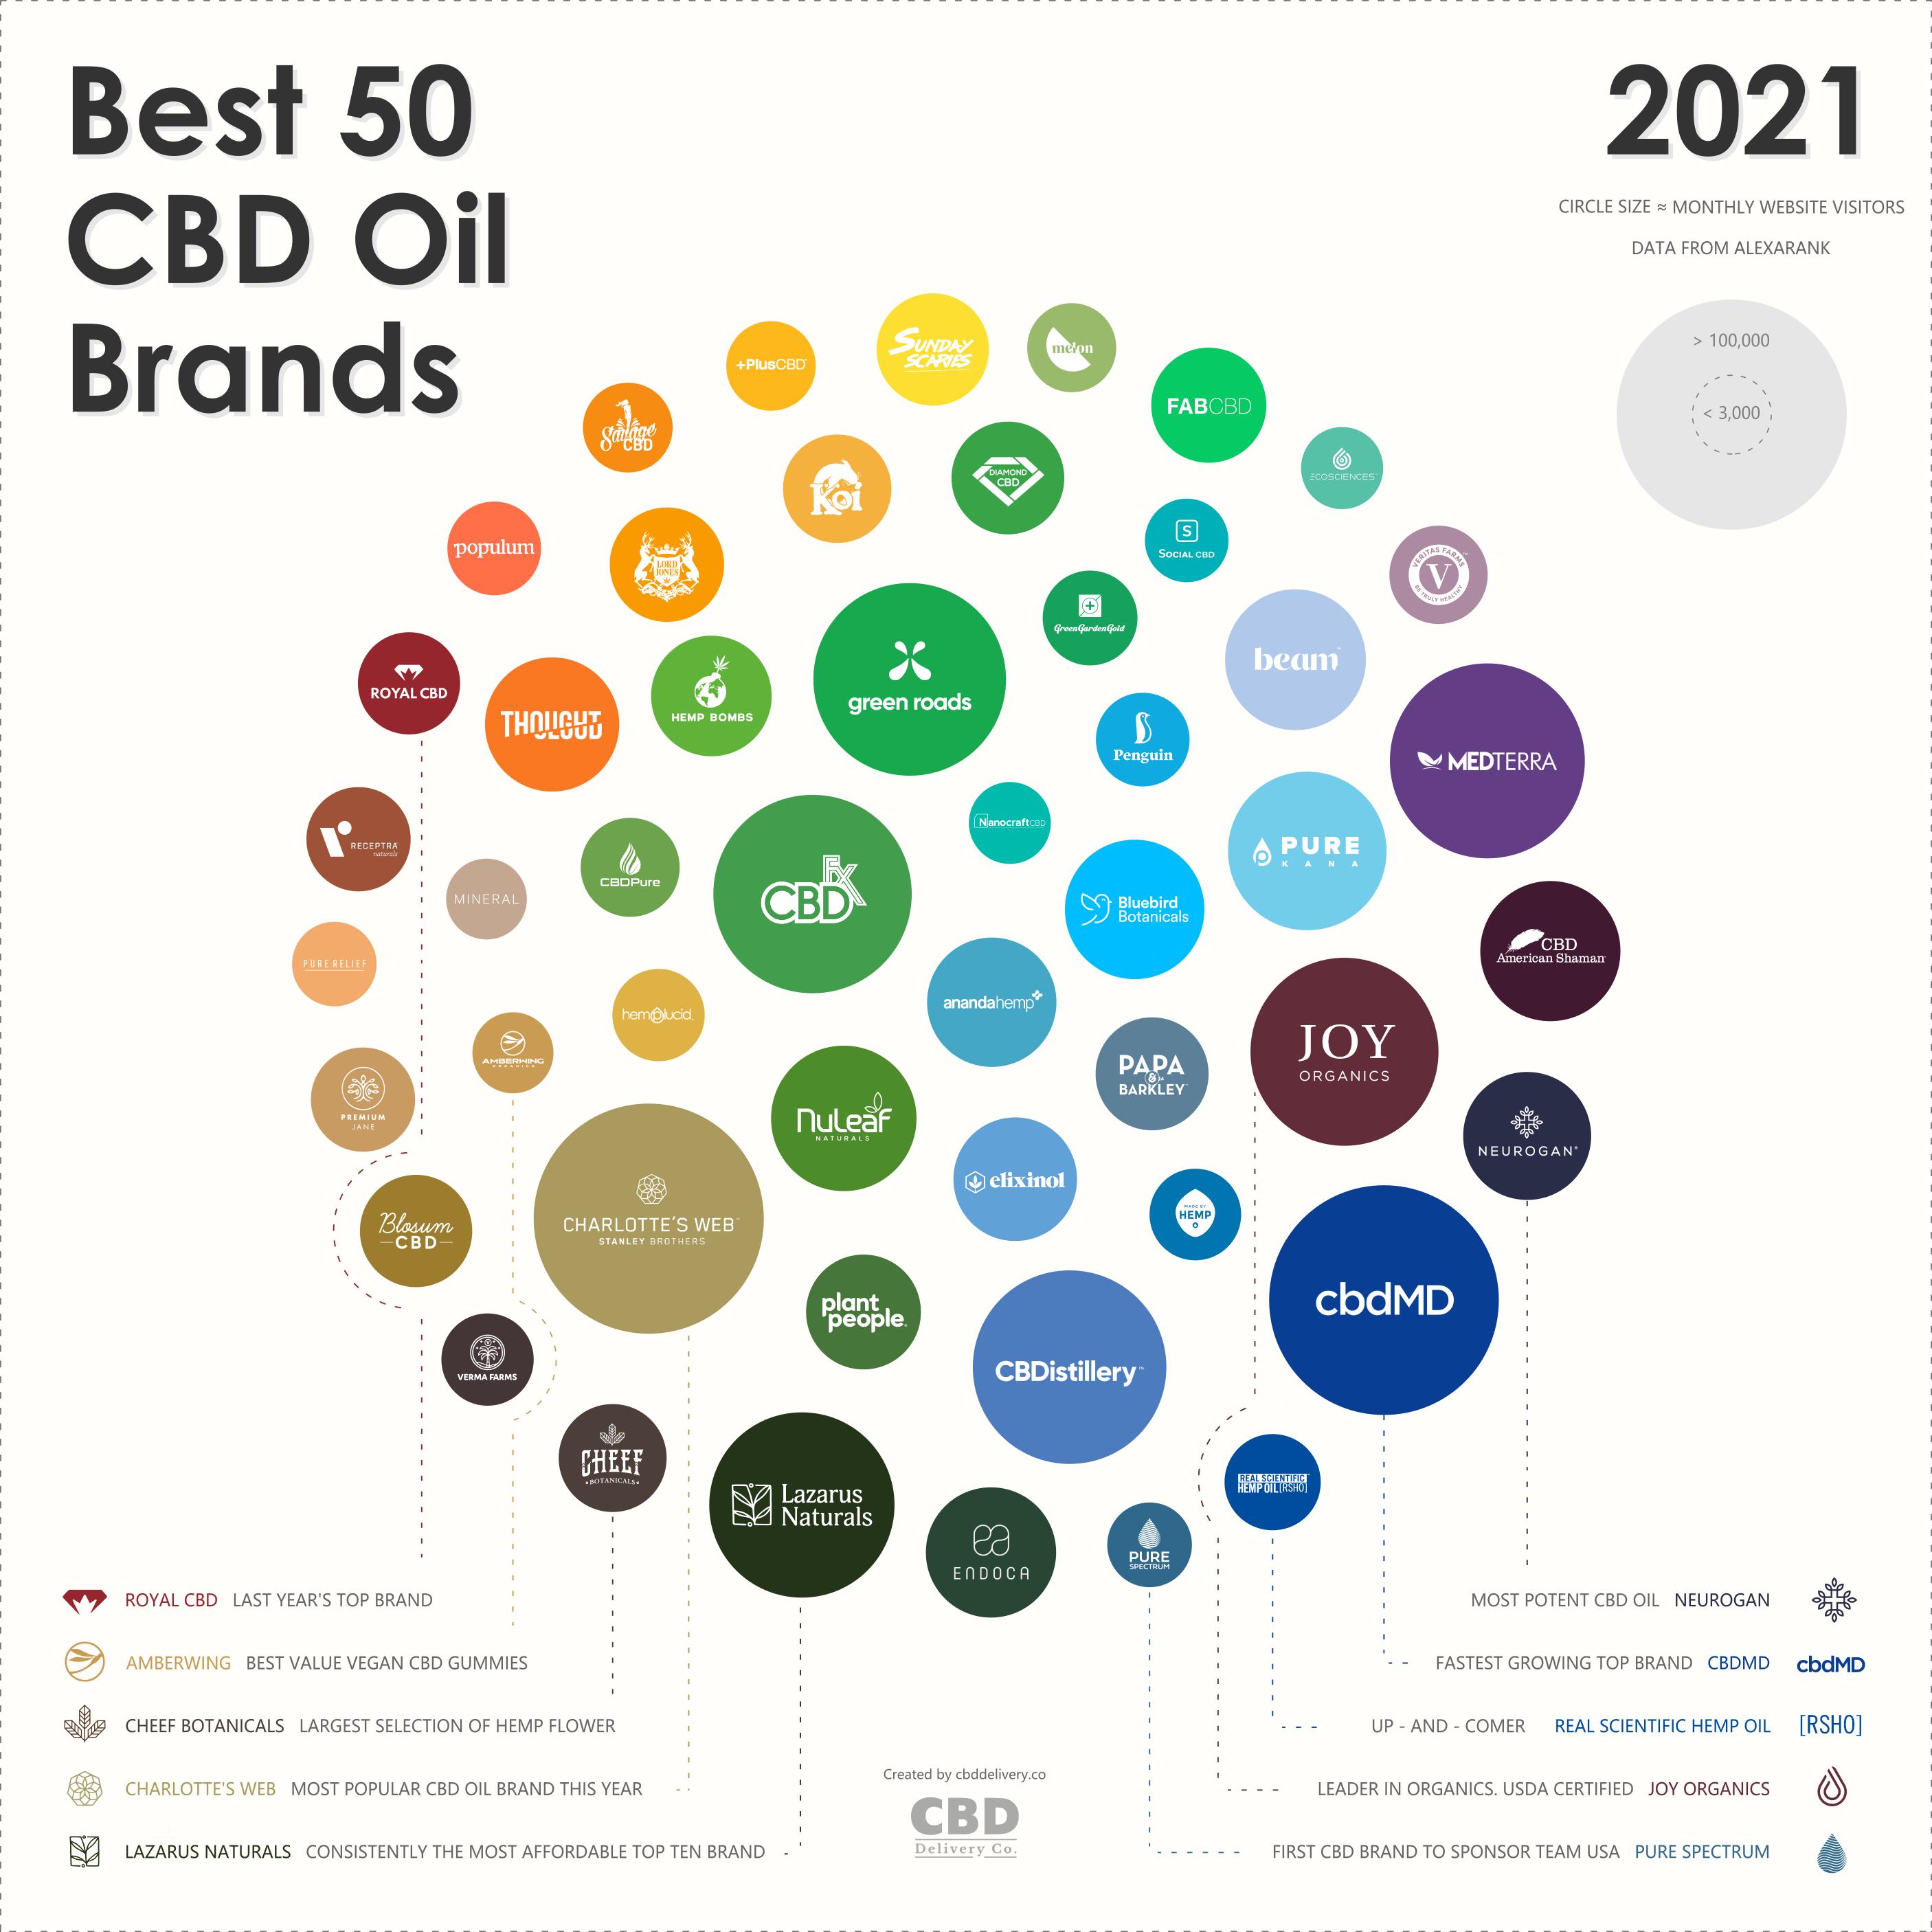 Best 50 CBD Oil Brands Infographic - 2021